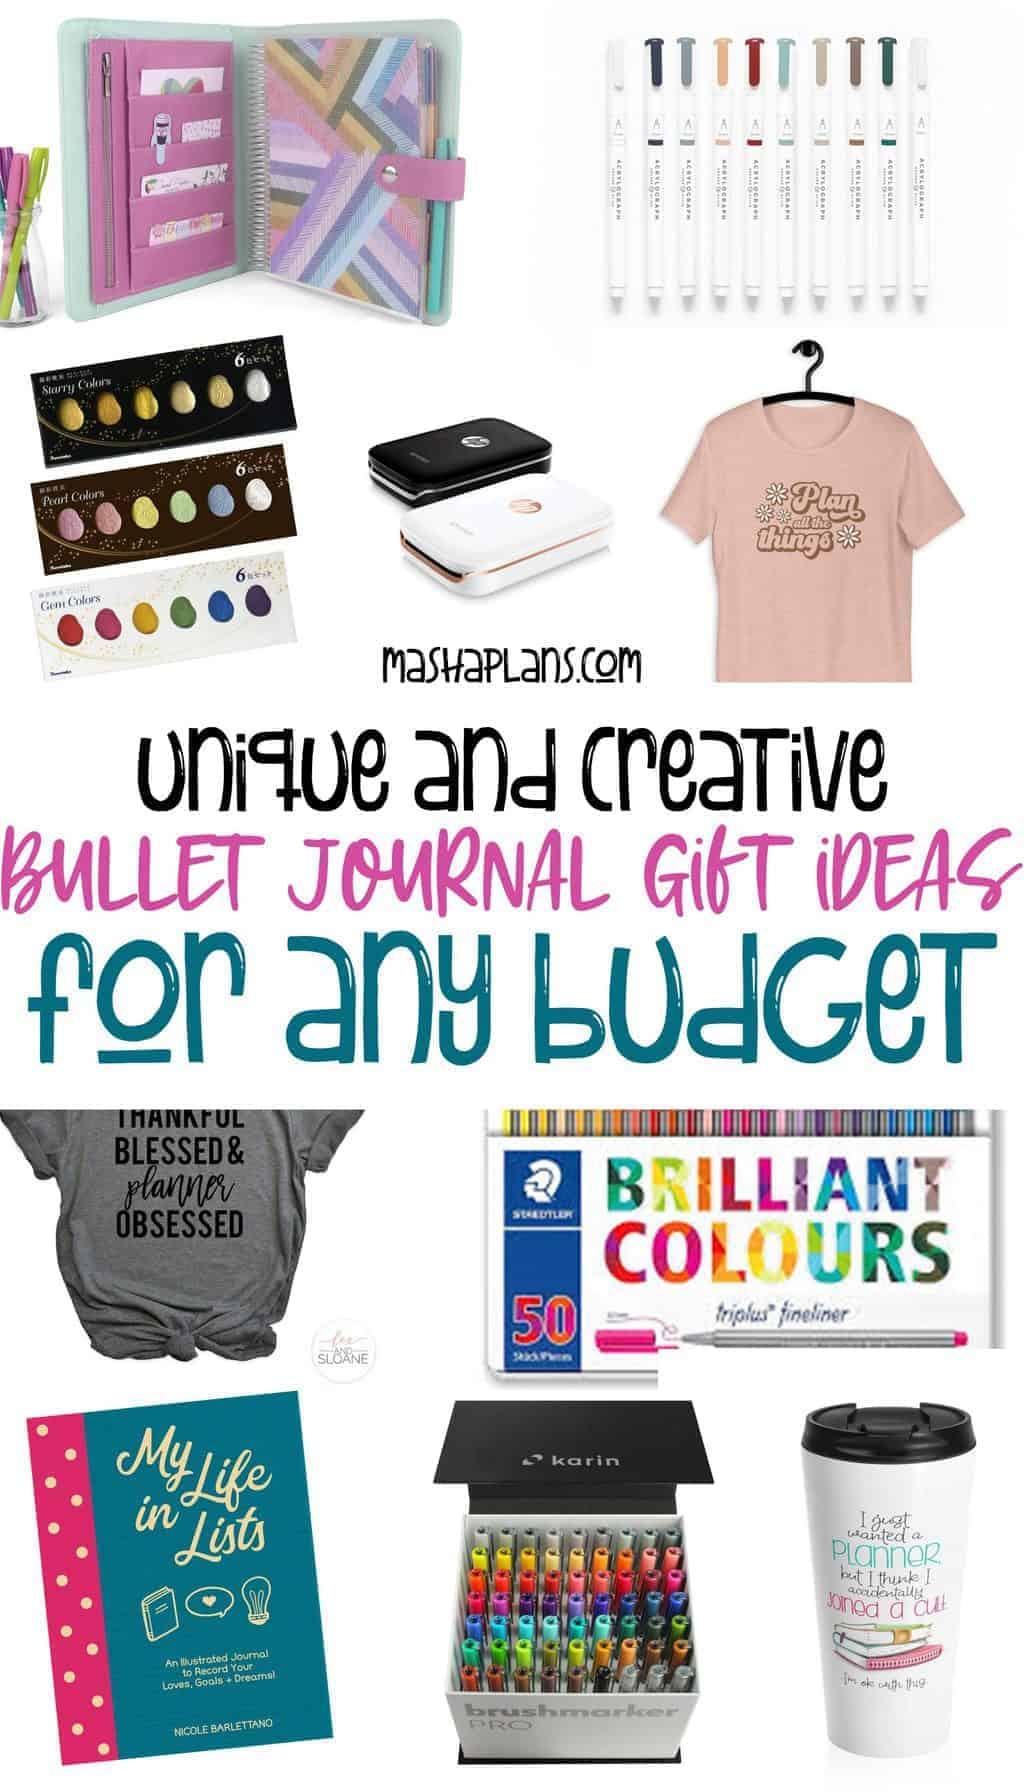 The Ultimate Bullet Journal Gift Guide   Masha Plans